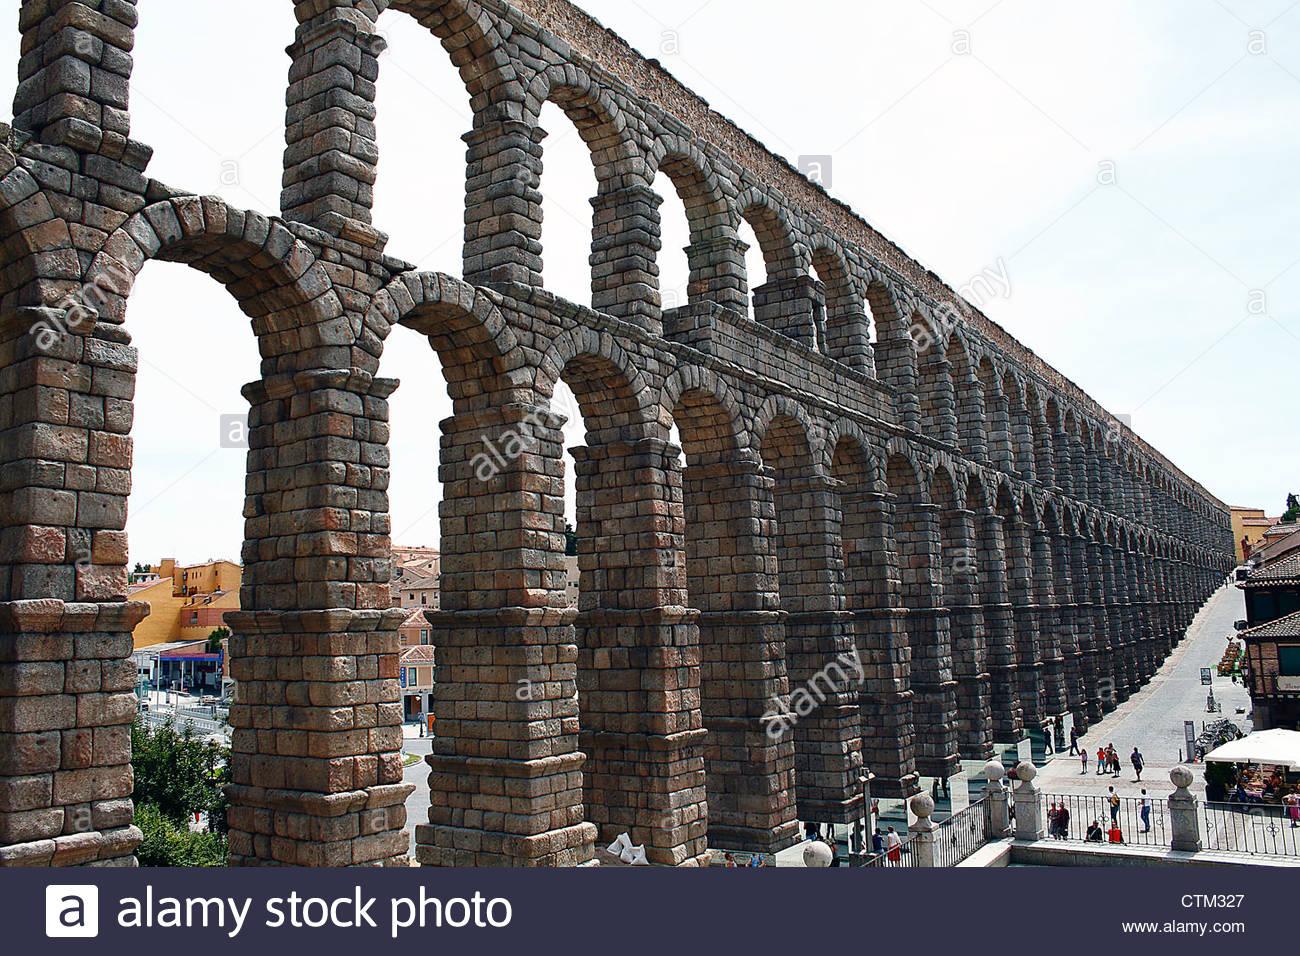 Acueducto de Segovia, acqueduct of Segovia, Spain. - Stock Image